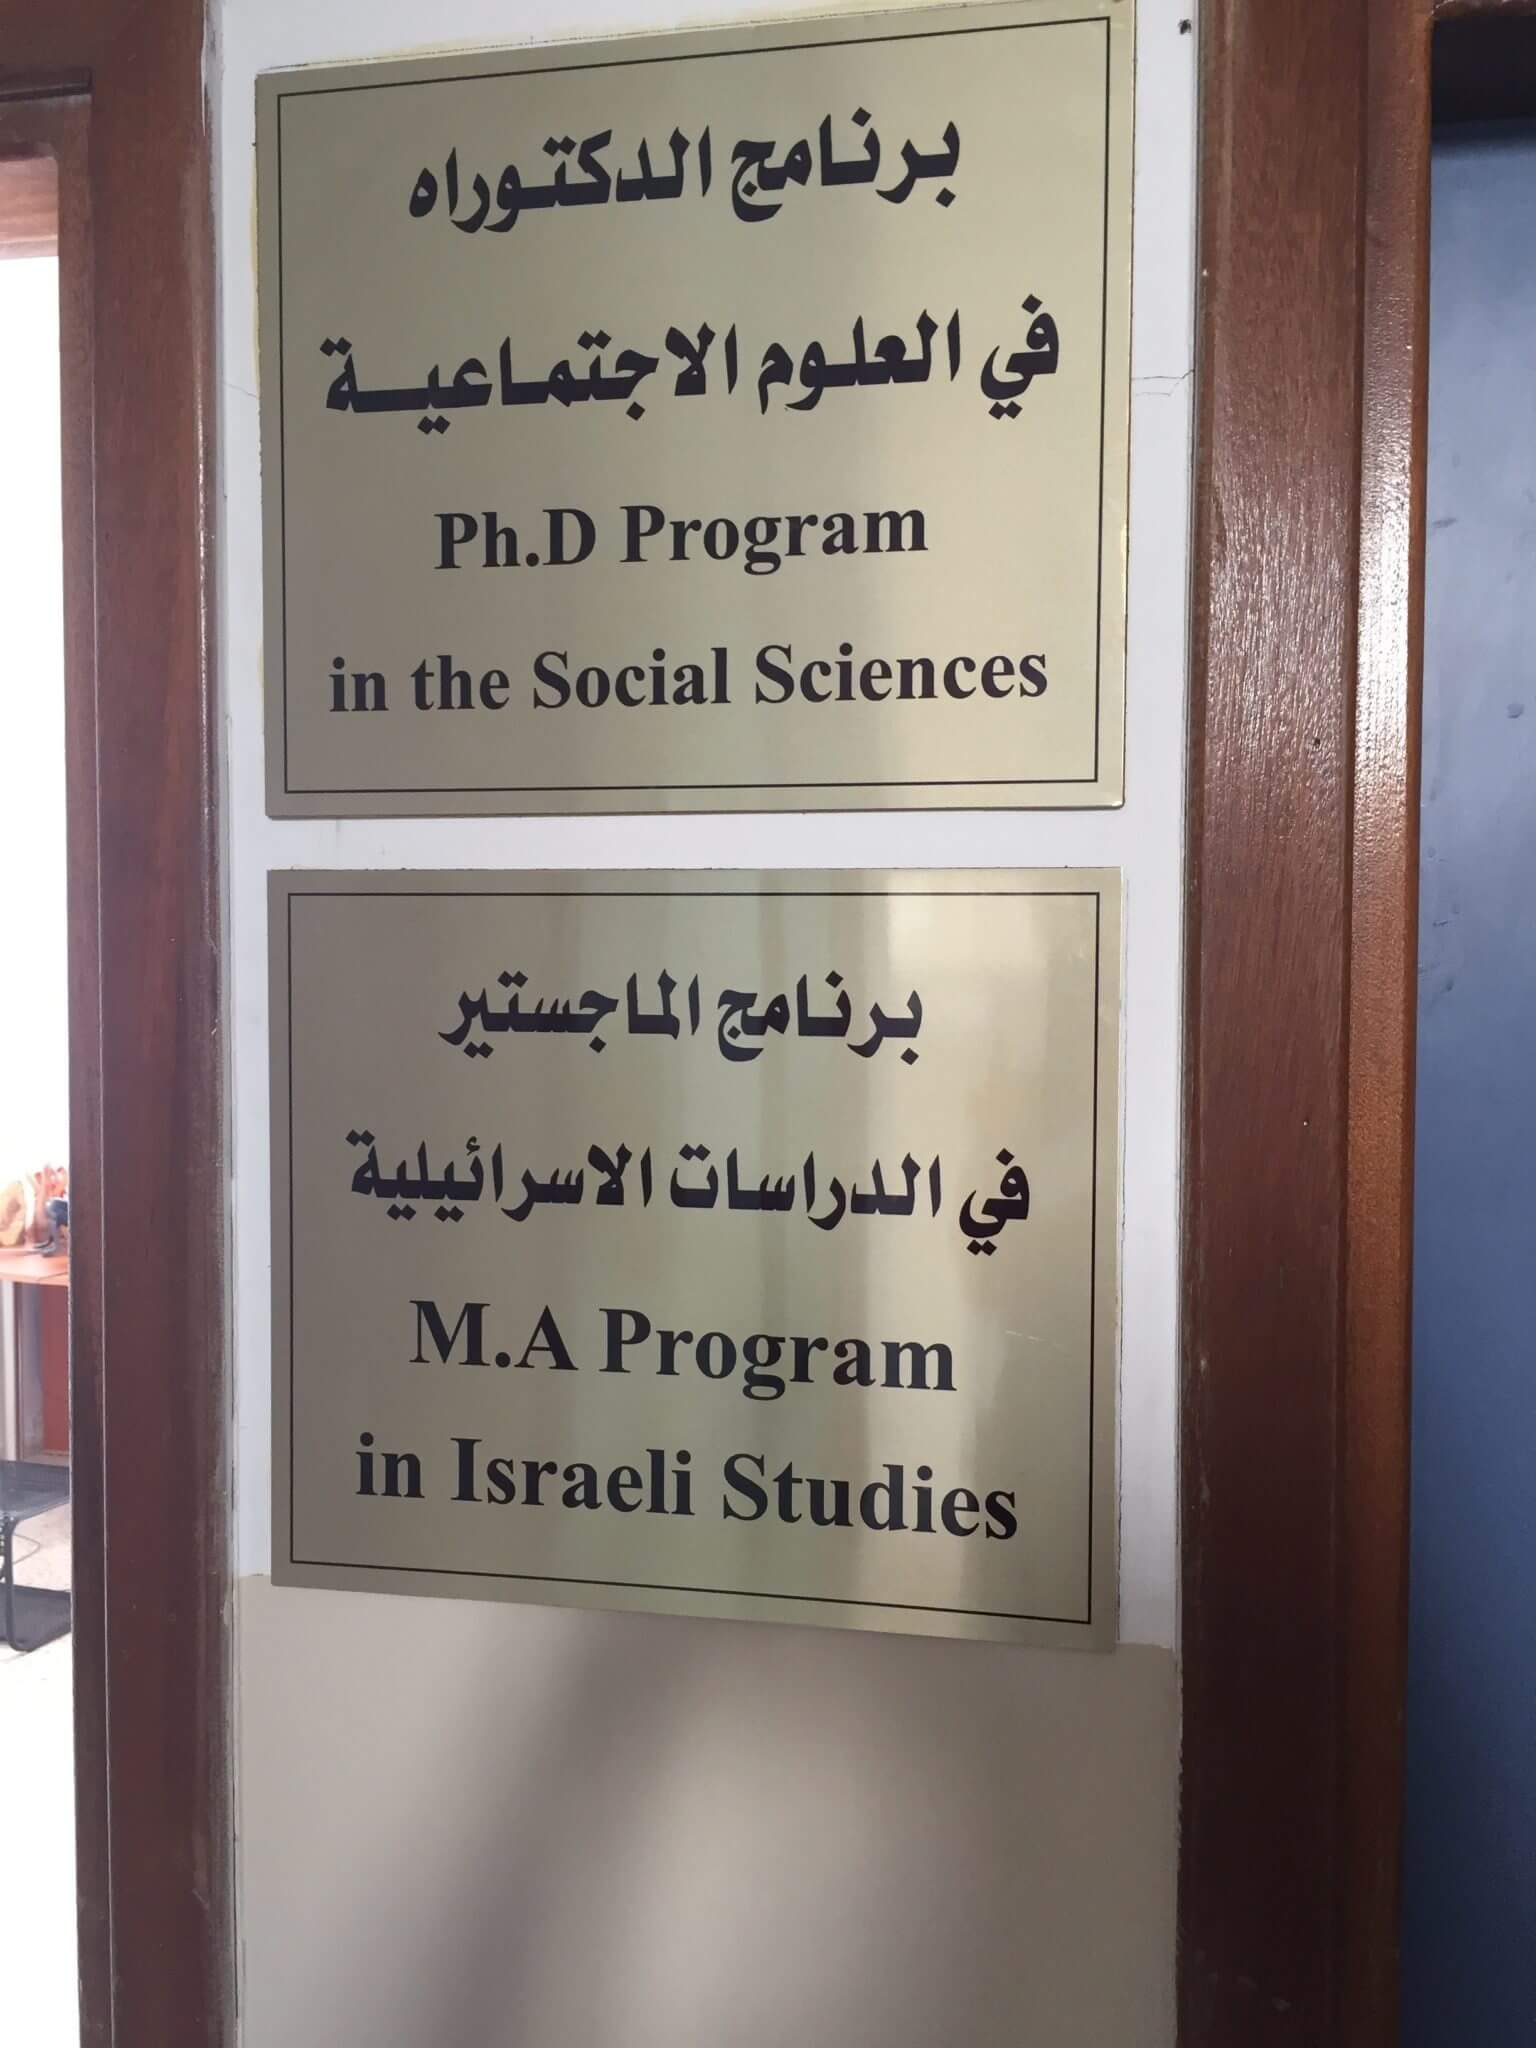 The Bir Zeit University Israel Studies program (Photo: Rebecca L. Stein)